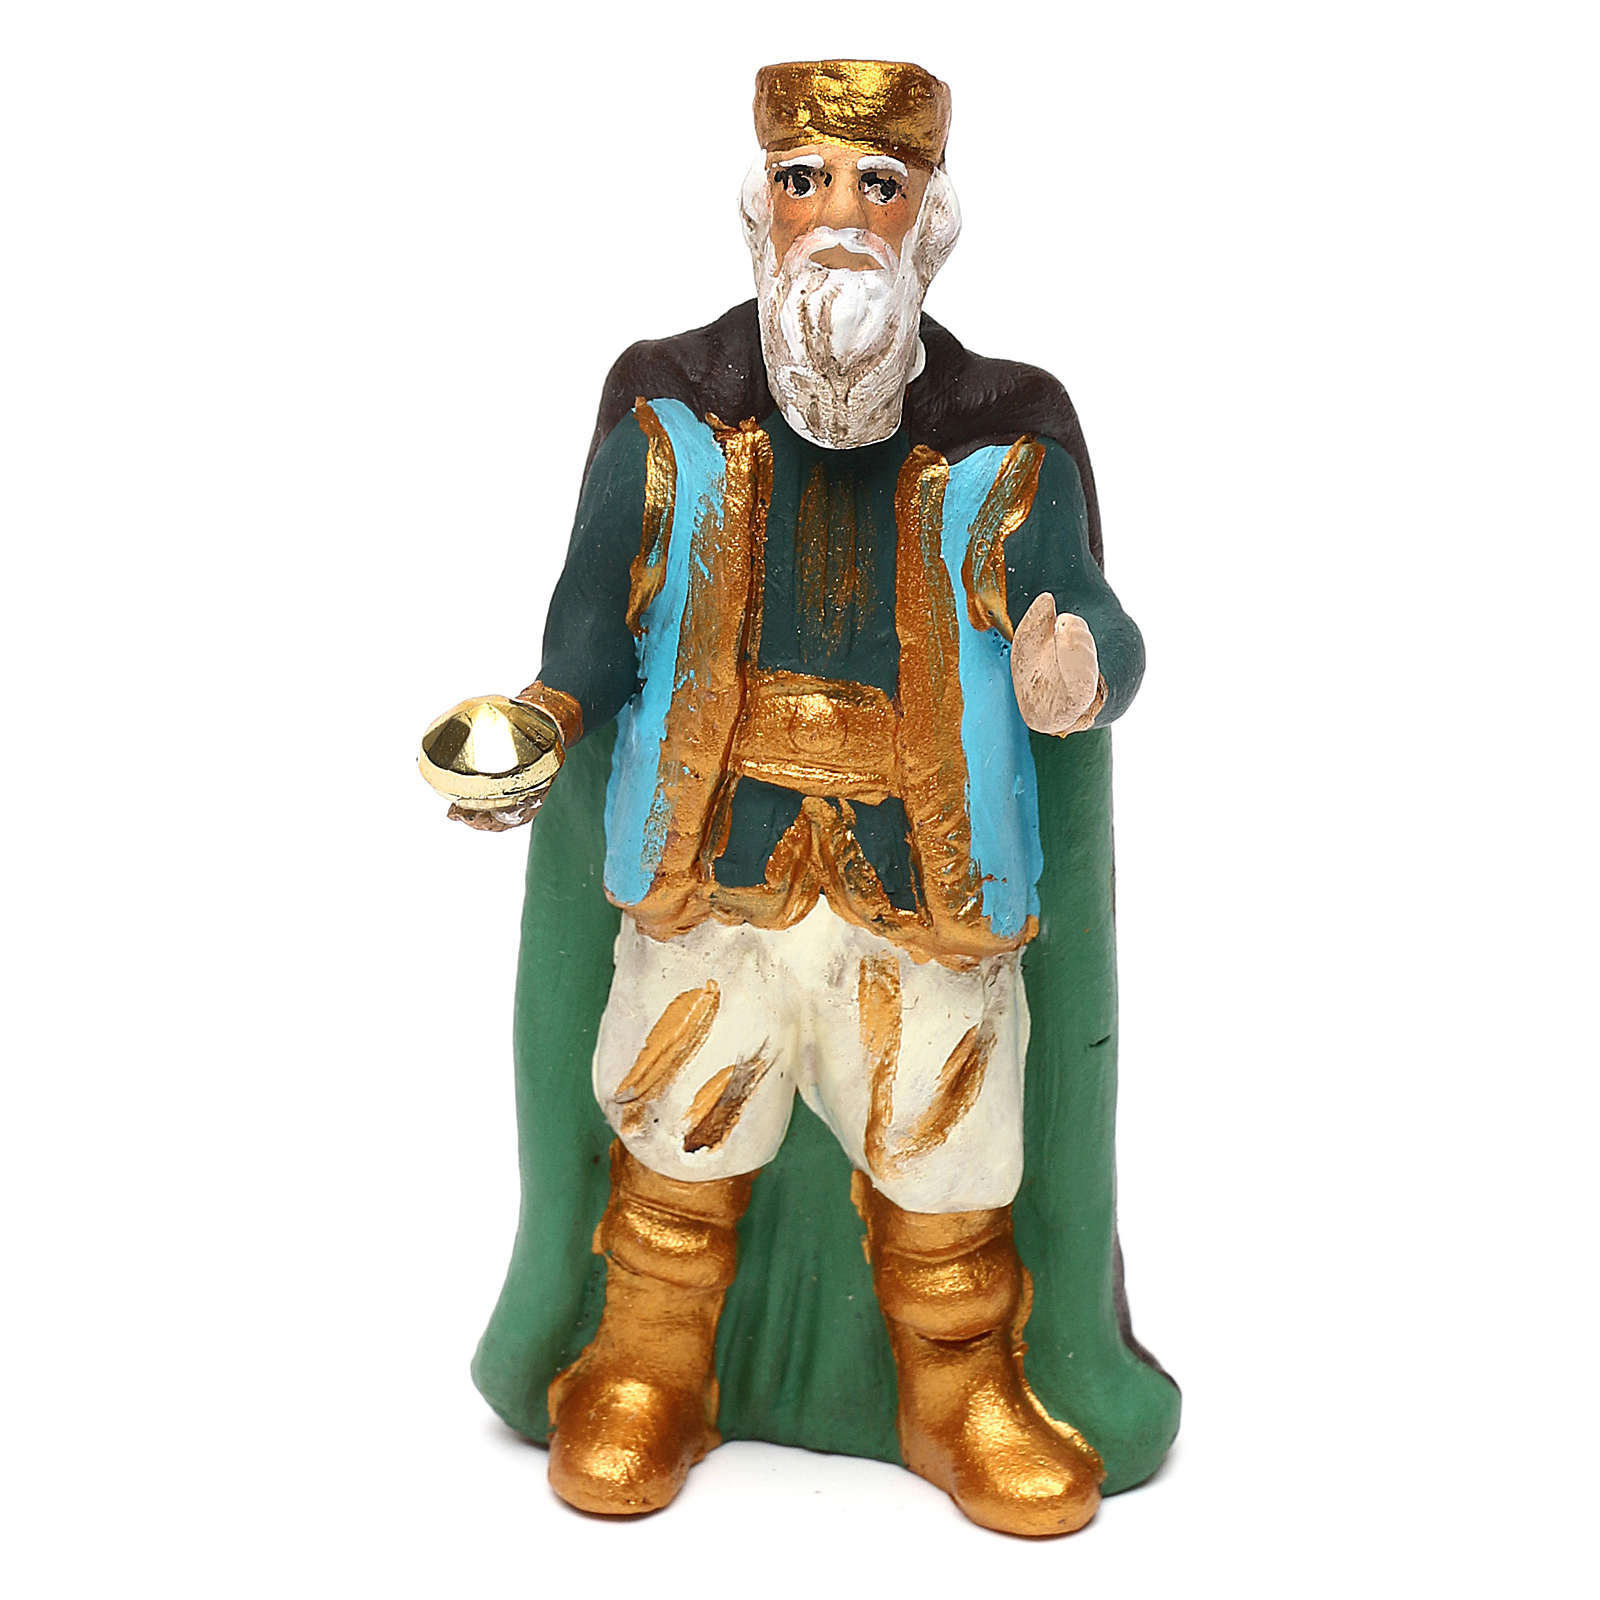 Re Magio vecchio terracotta dipinta presepe napoletano 8 cm 4